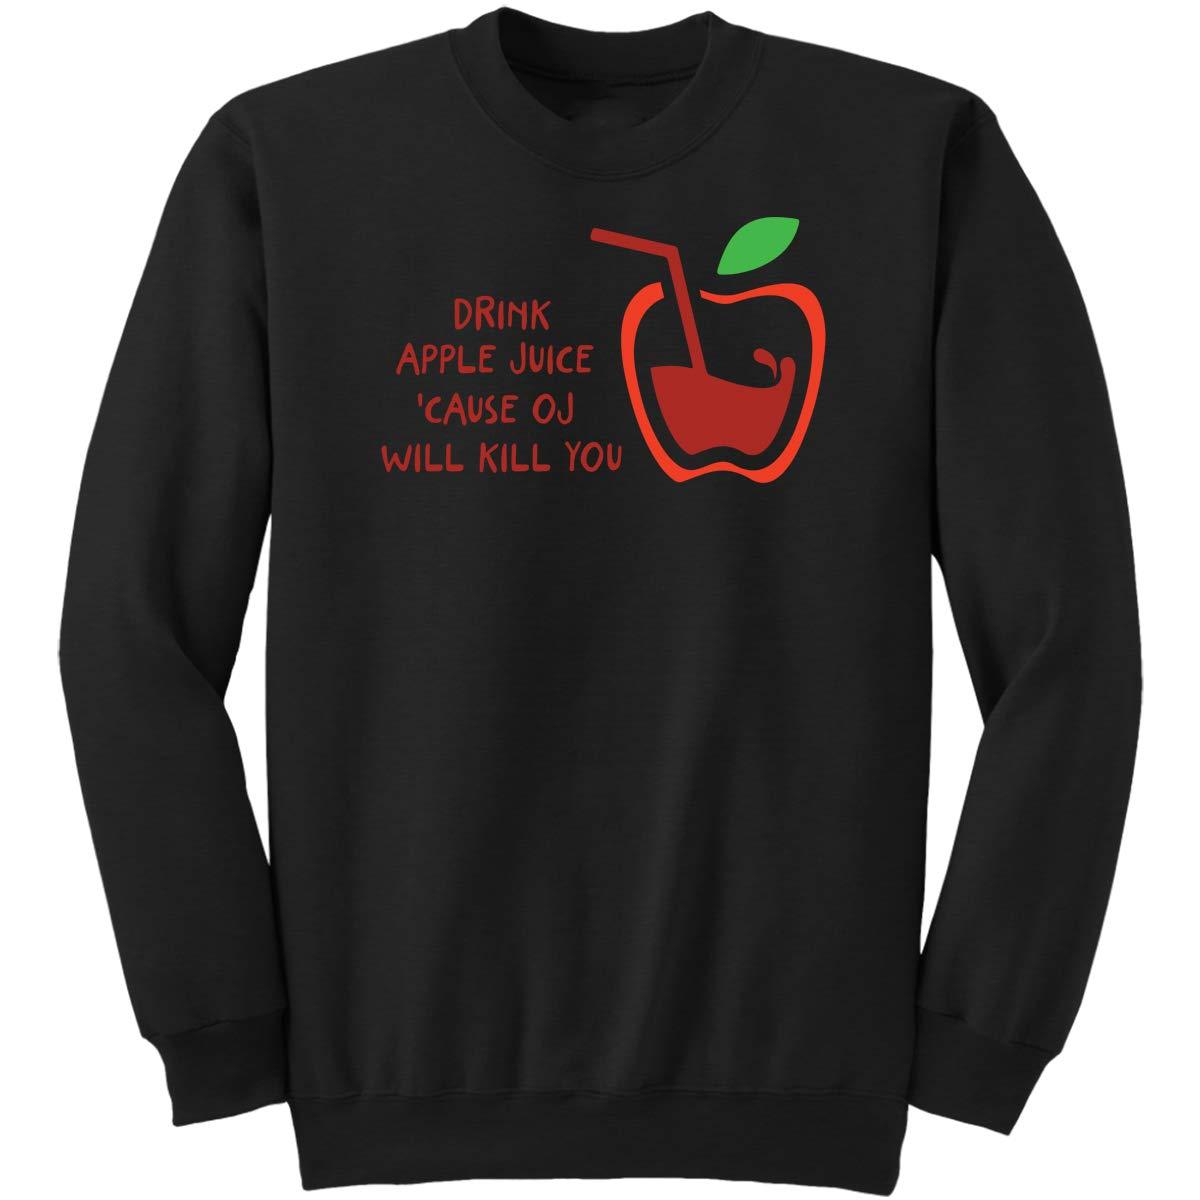 Drink Apple Juice 'Cause Oj Will Kill You Funny Gift Idea